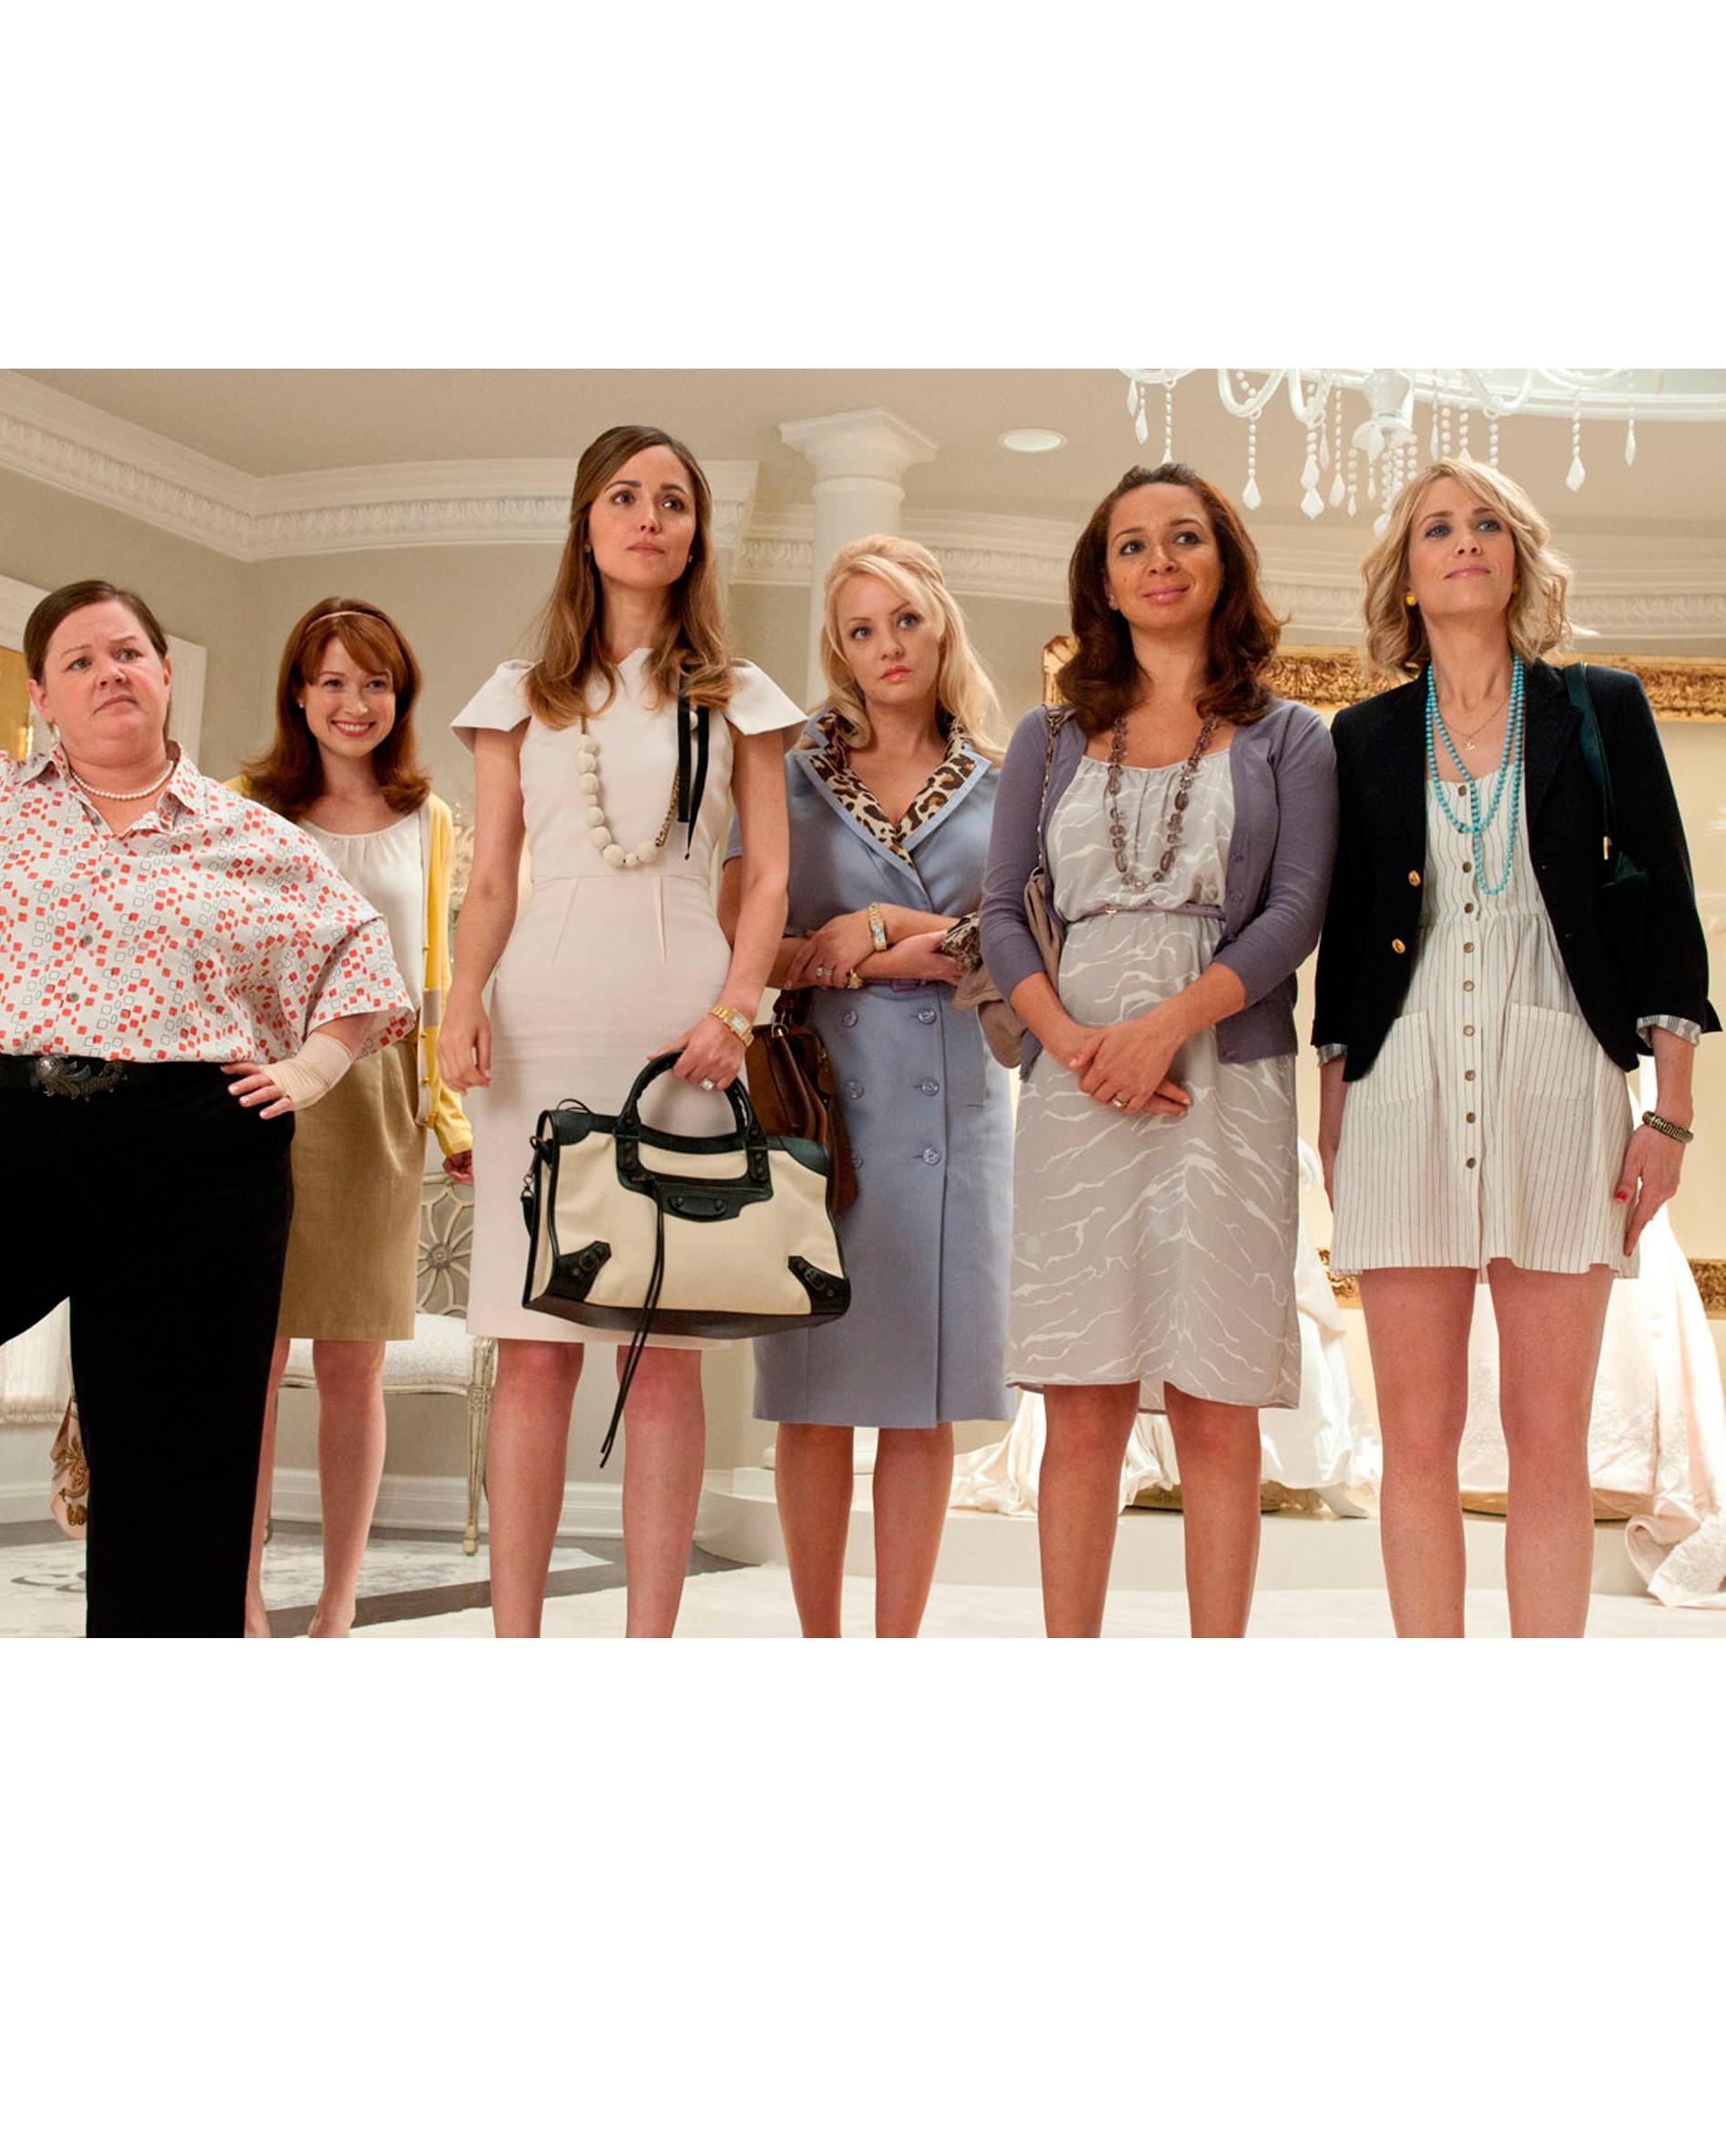 bridesmaids-movie-dress-shopping-1015.jpg